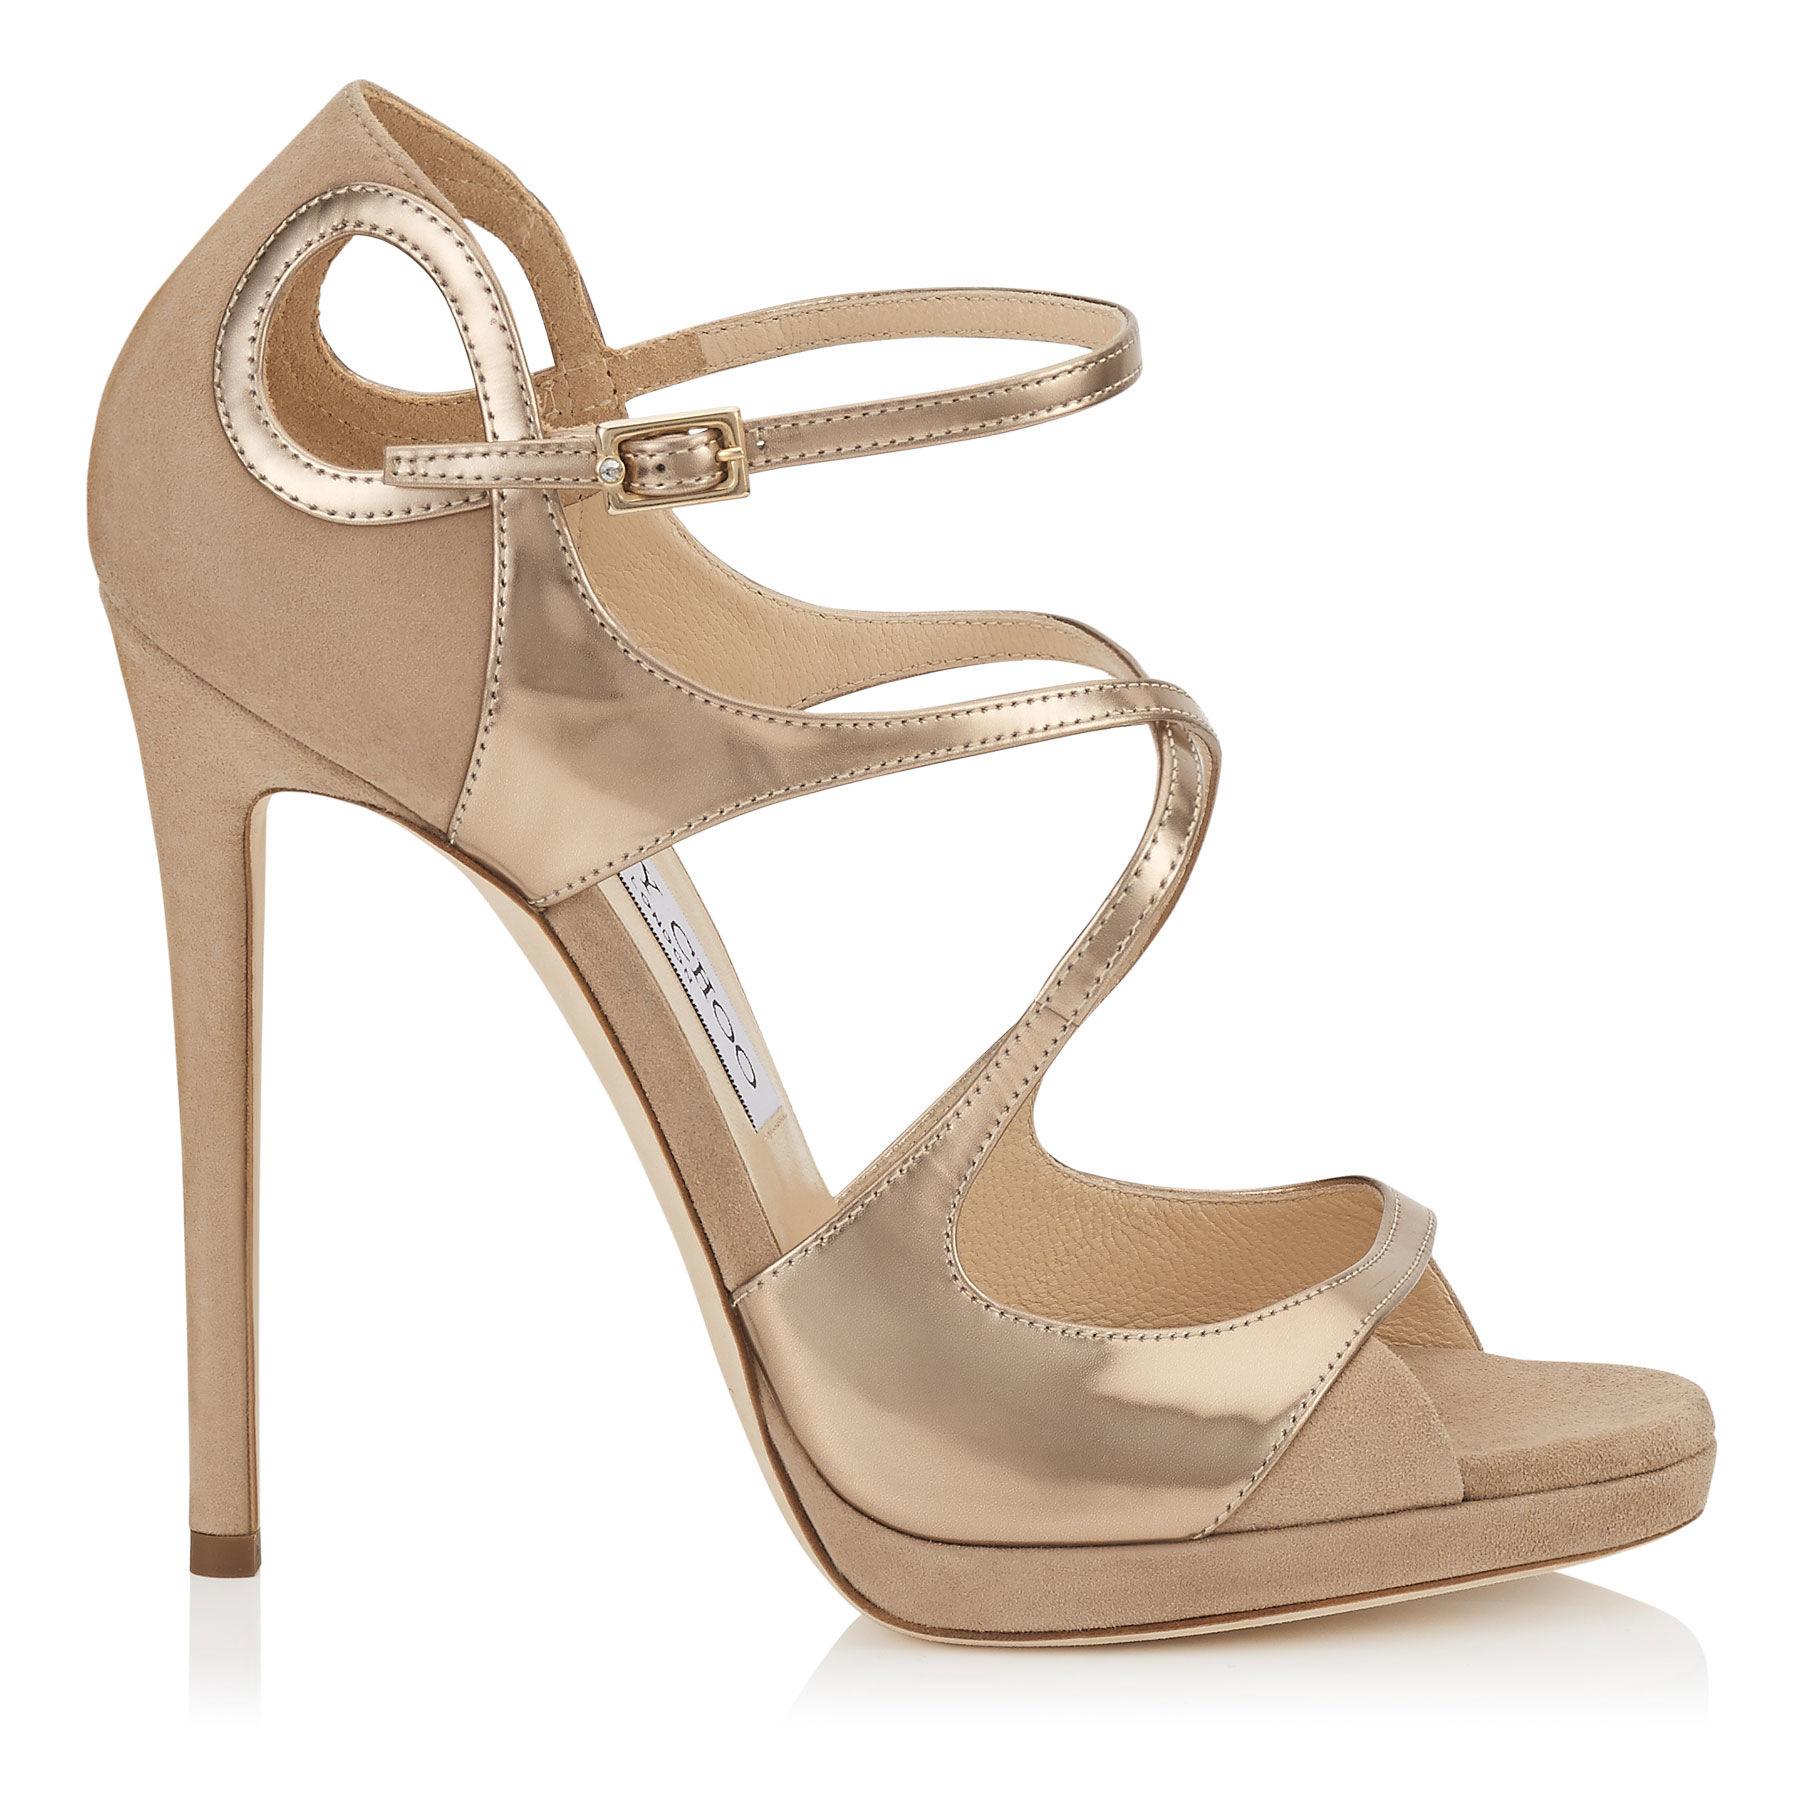 507535b59c78 Jimmy Choo Patent Zigzag Anklewrap Sandal in Natural - Lyst